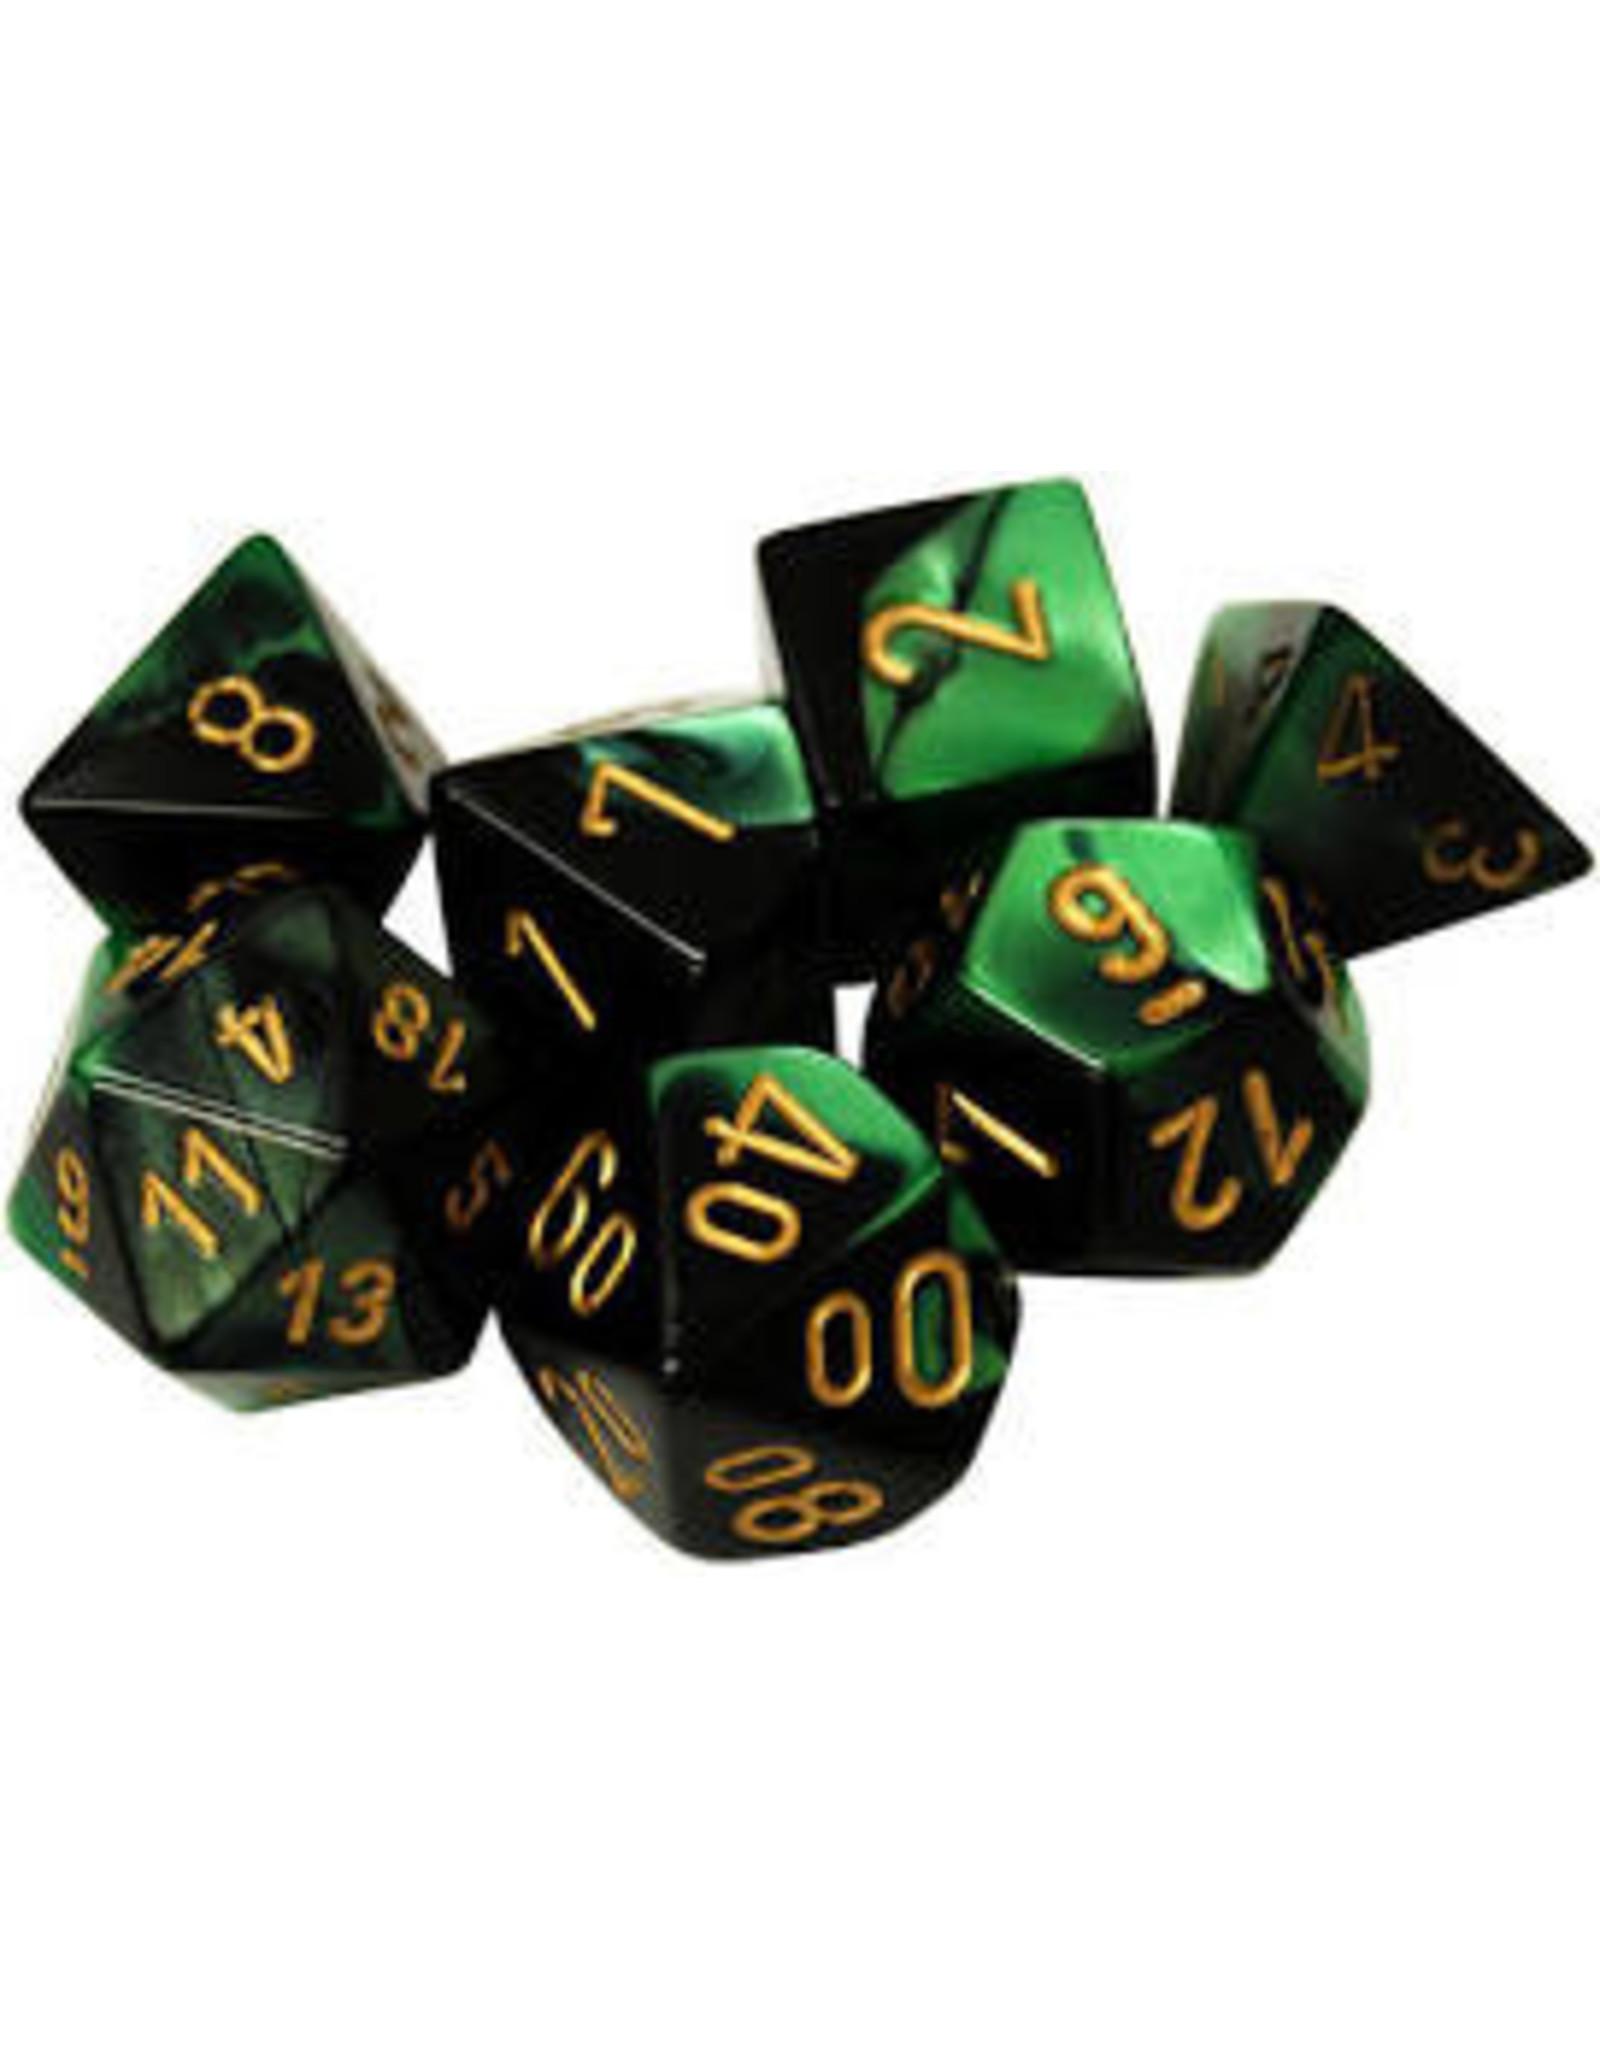 Chessex Gemini 4 Poly Black Green/gold